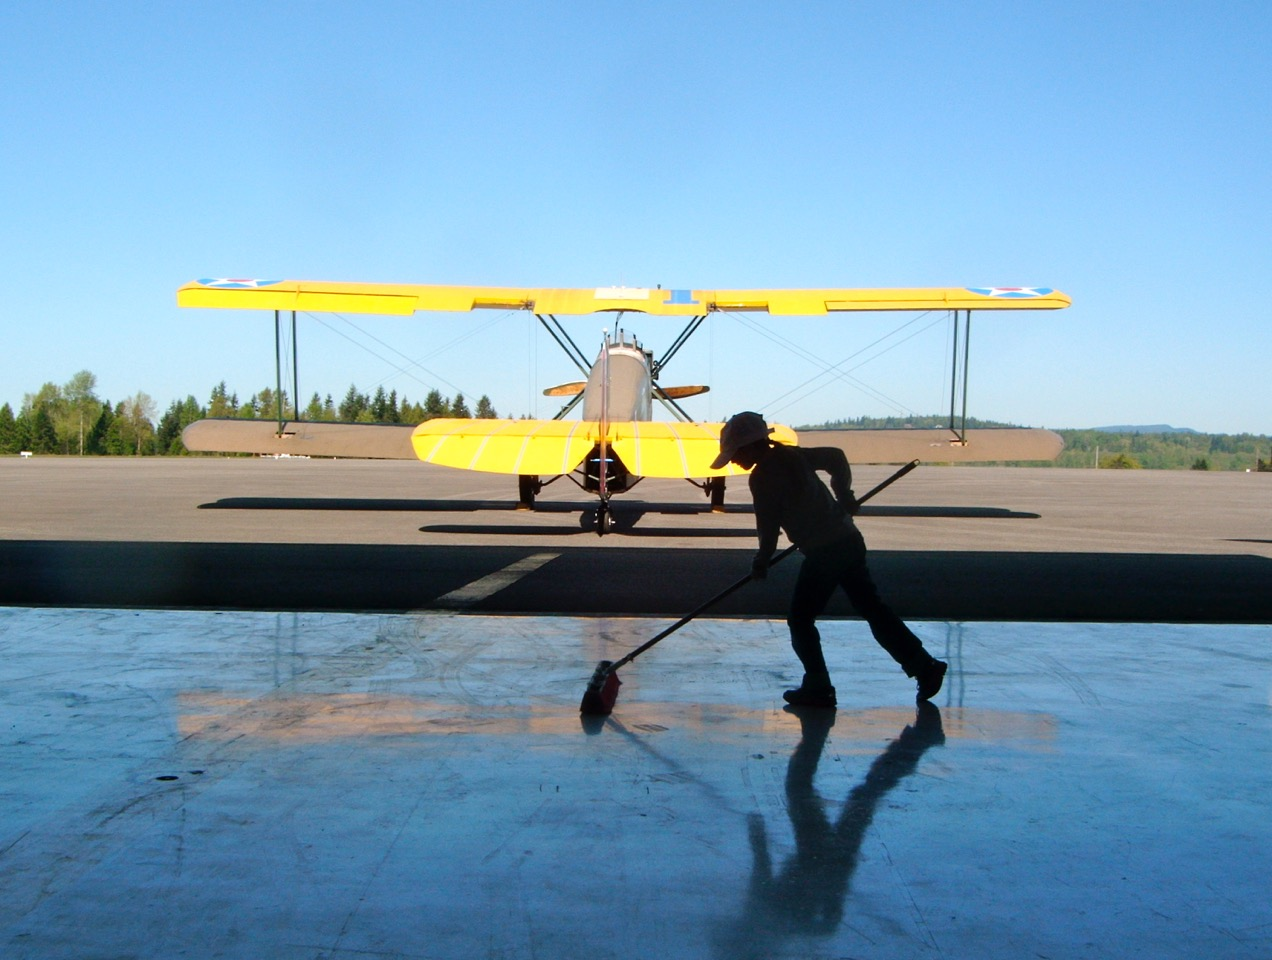 Ava preps the Arlington Flight Services hangar for our flight test program.